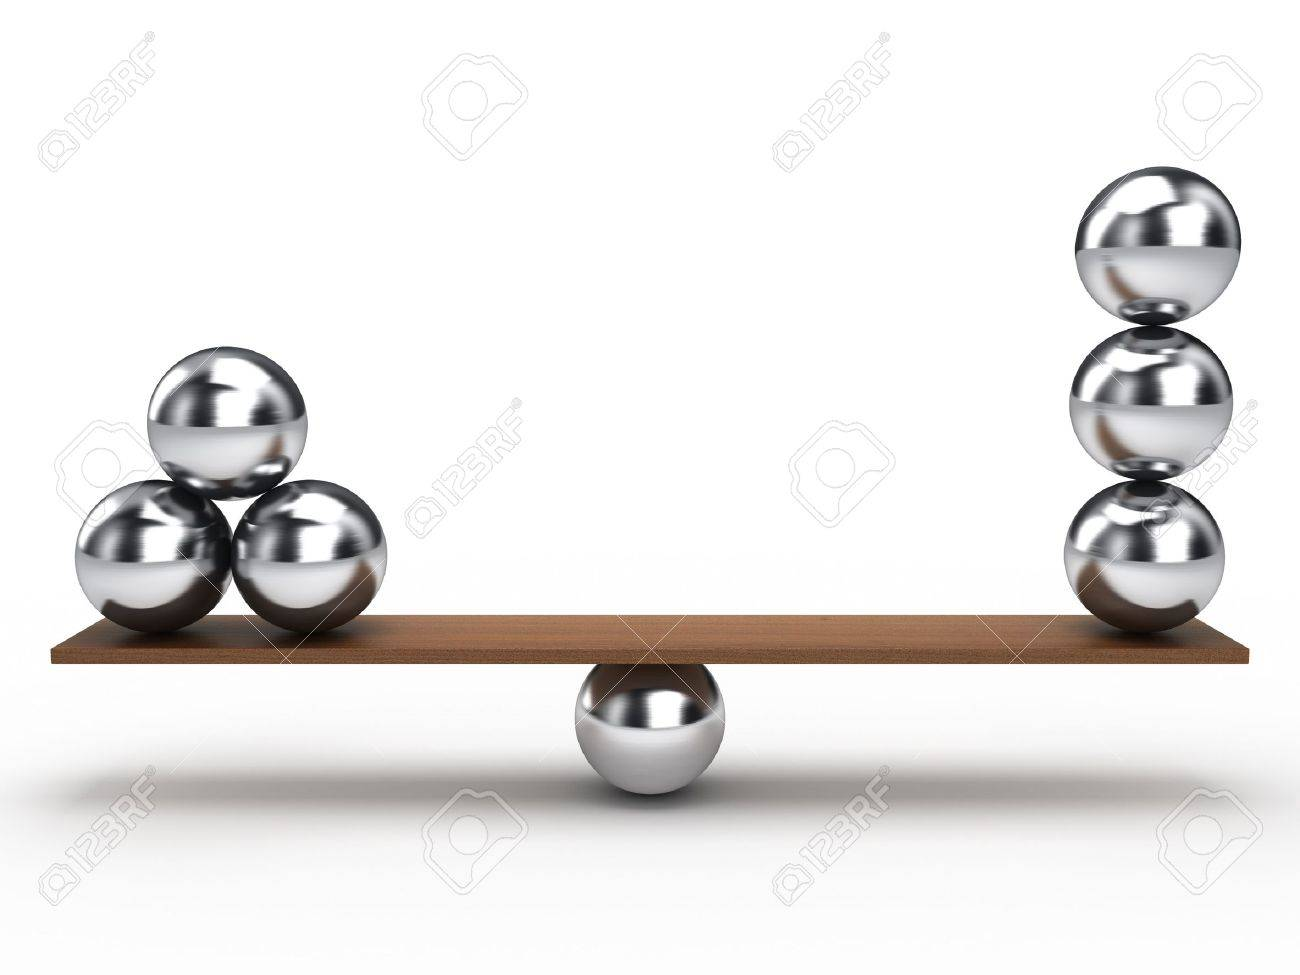 Balancing Balls On Wooden Board Stock Photo   9033681